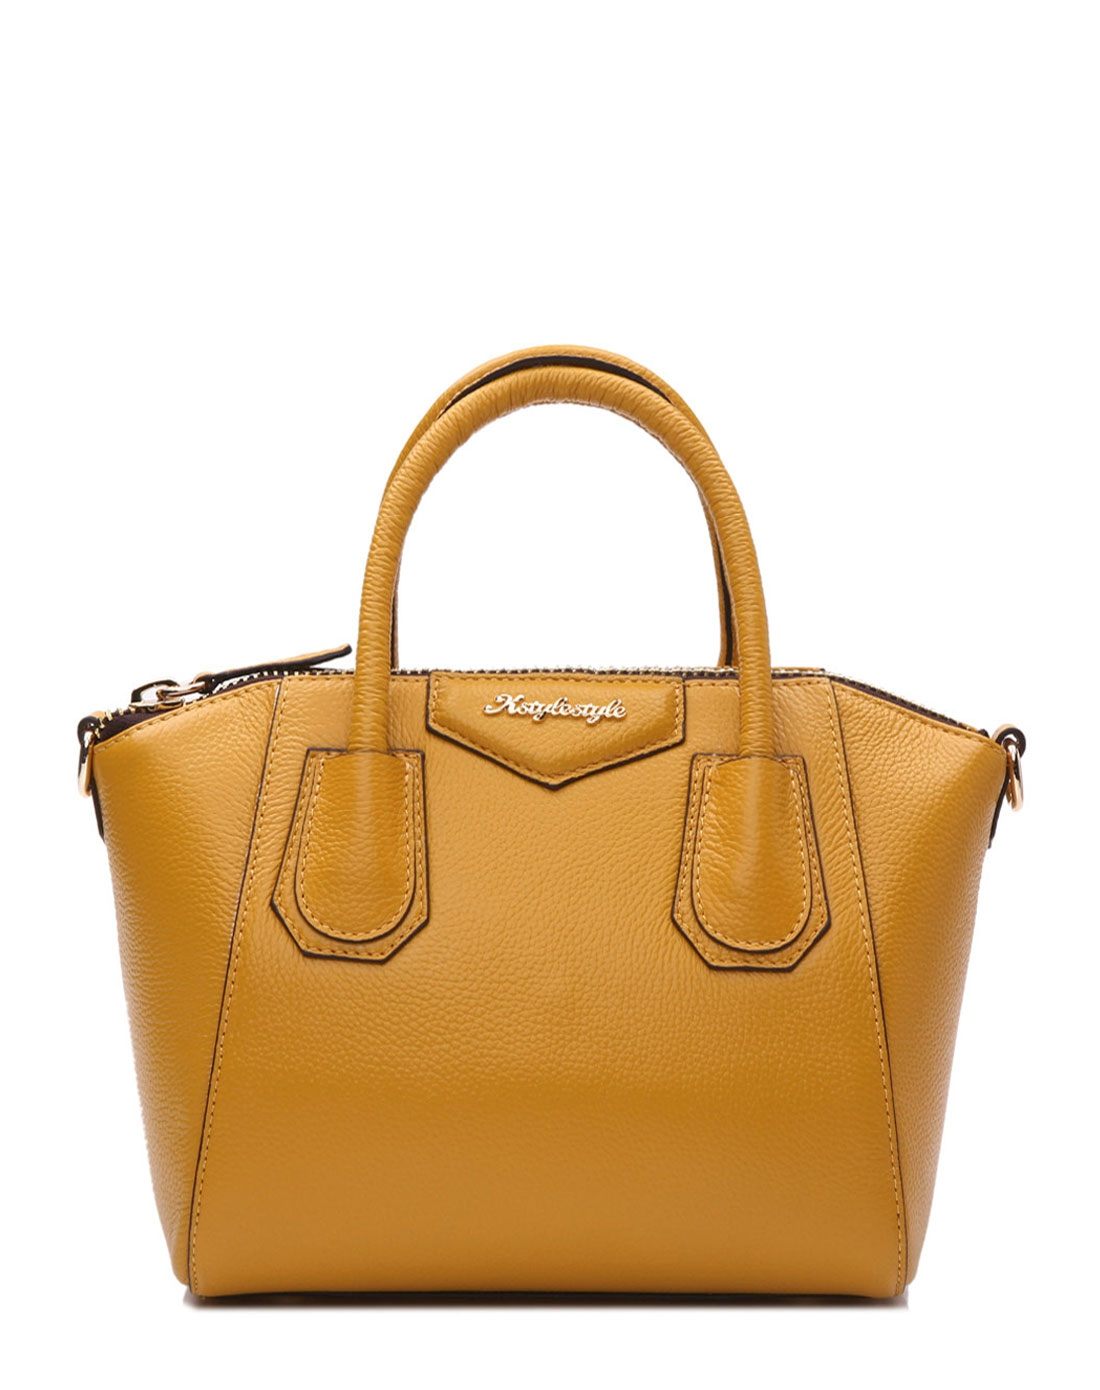 style黄色牛皮时尚可爱女包waomk2481-137